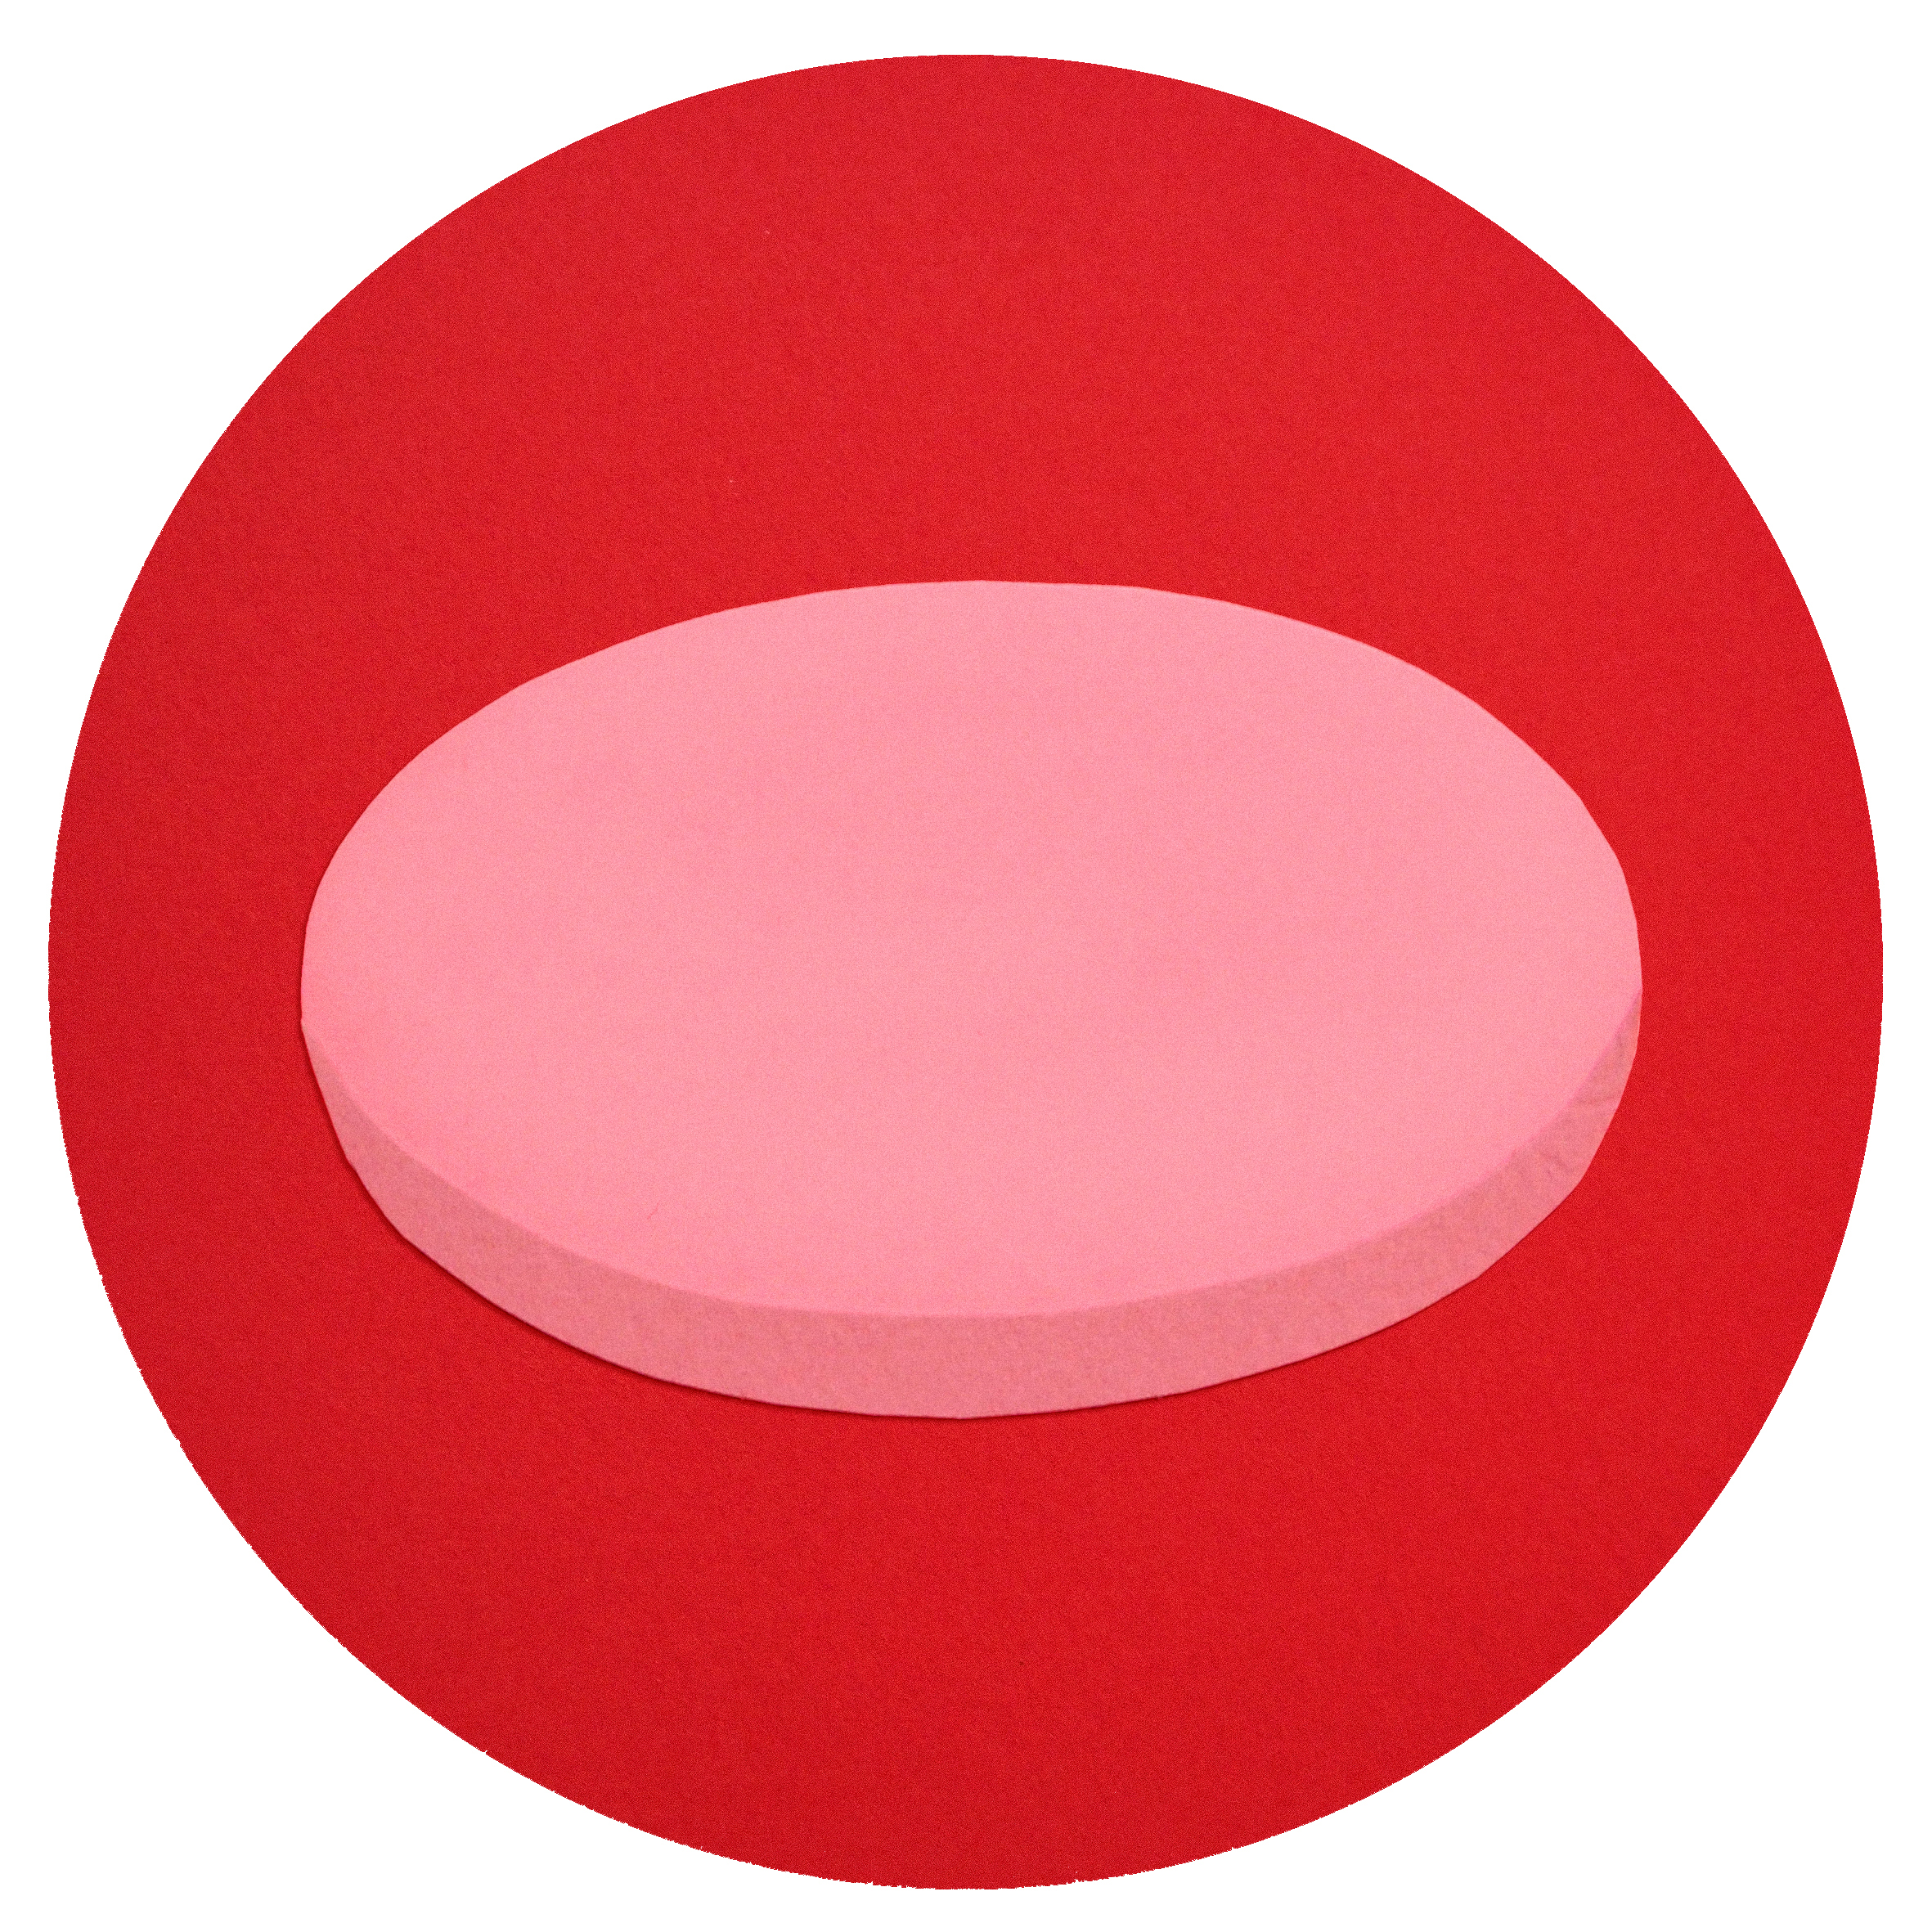 pinkred.jpg